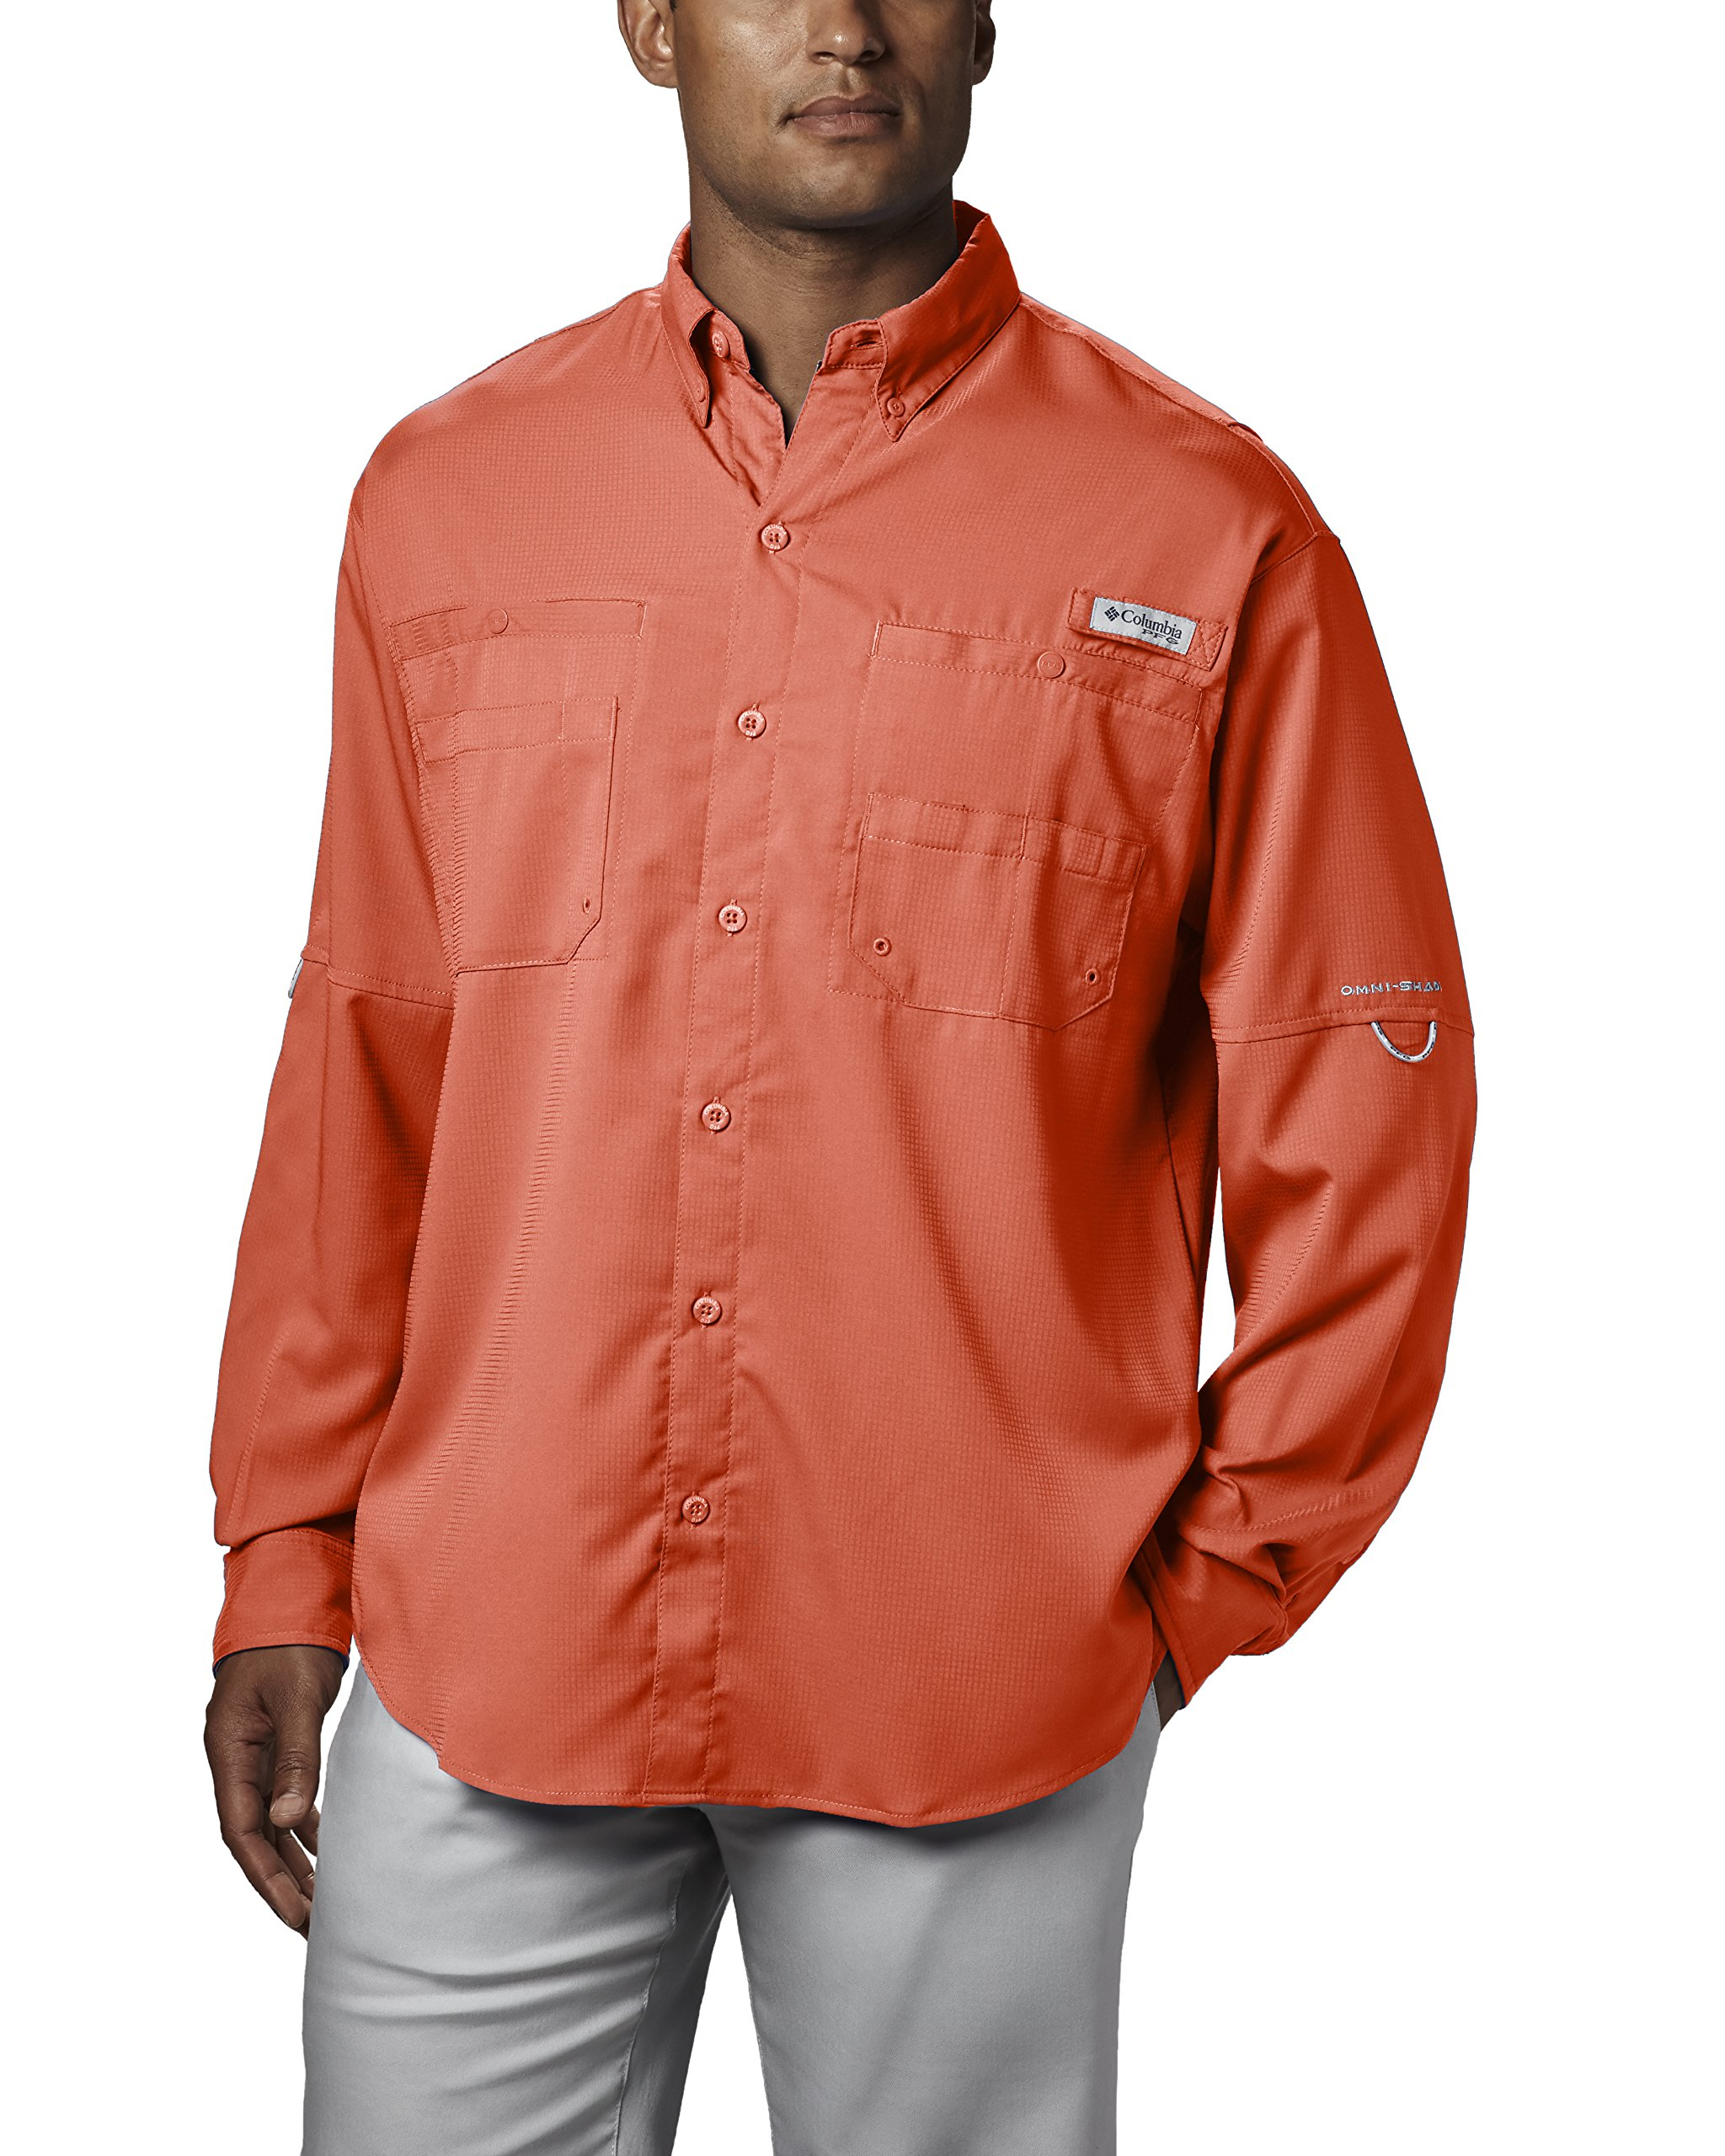 Columbia Men's PFG Tamiami II Long Sleeve Shirt , Bright Peach, X-Small